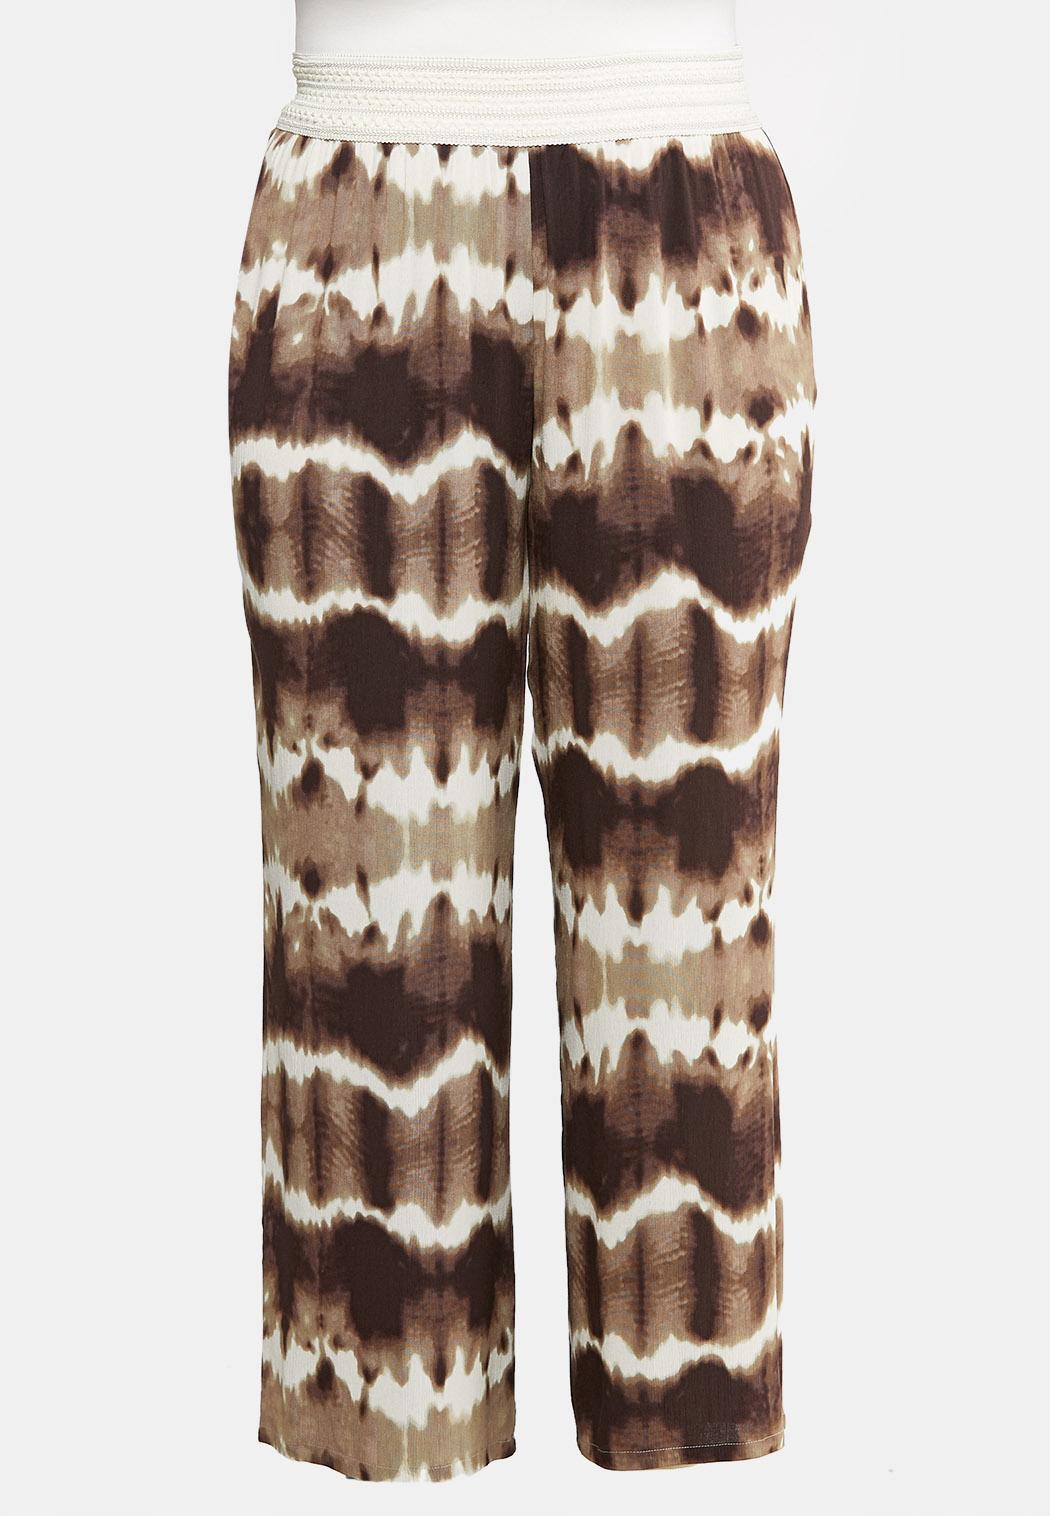 Plus Size Crochet Waist Gauze Palazzo Pants